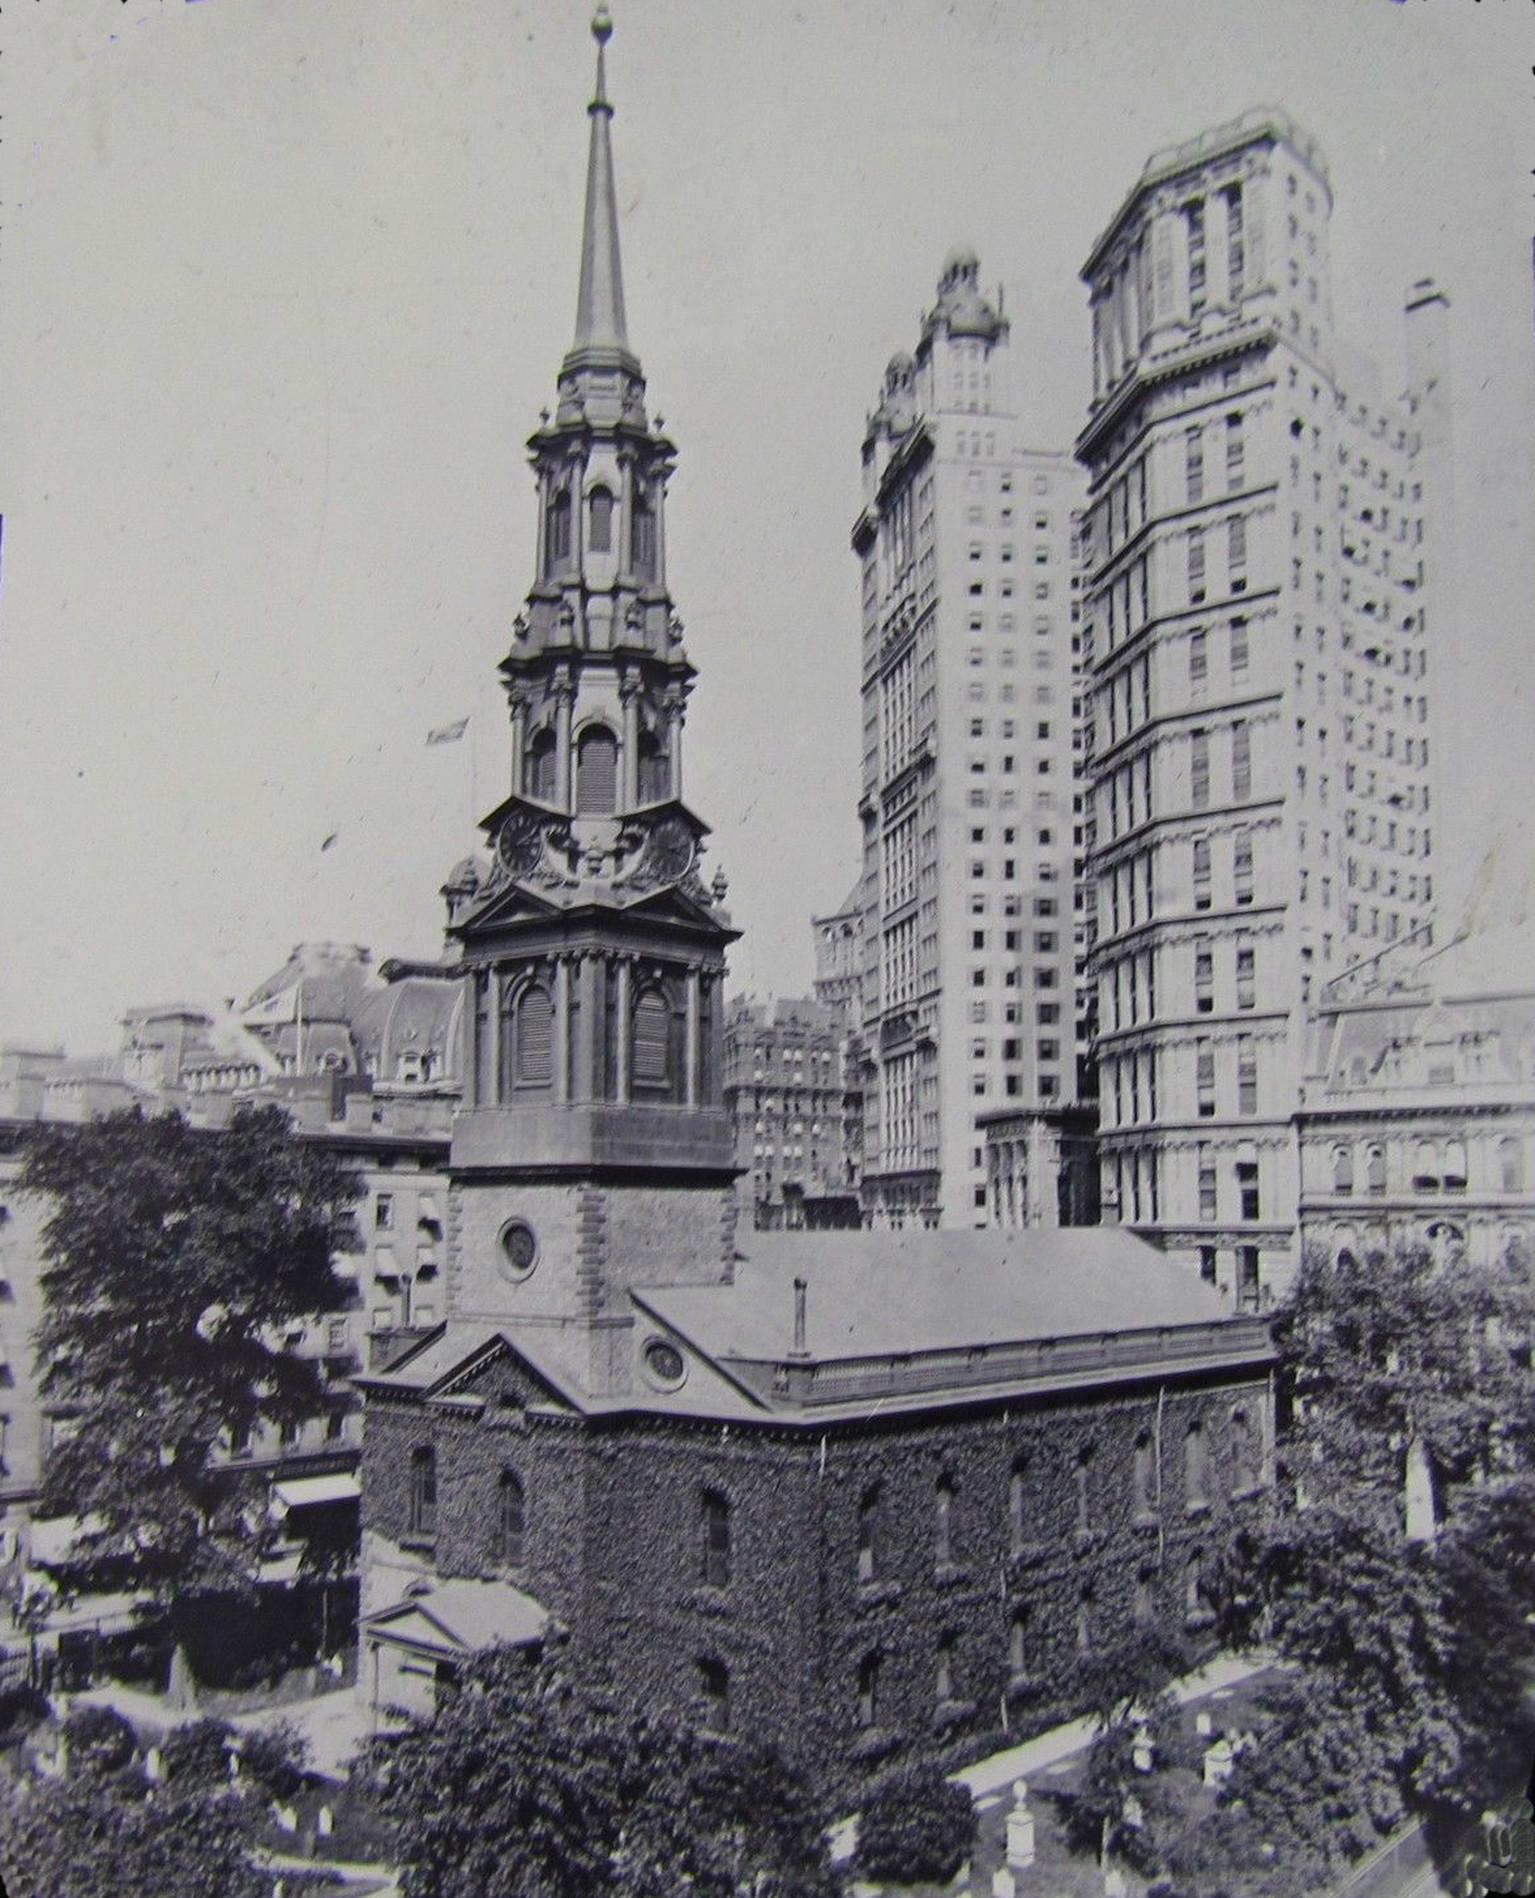 Old New York In Photos #105 - St. Paul's Chapel, St. Paul Building & Park Row Building